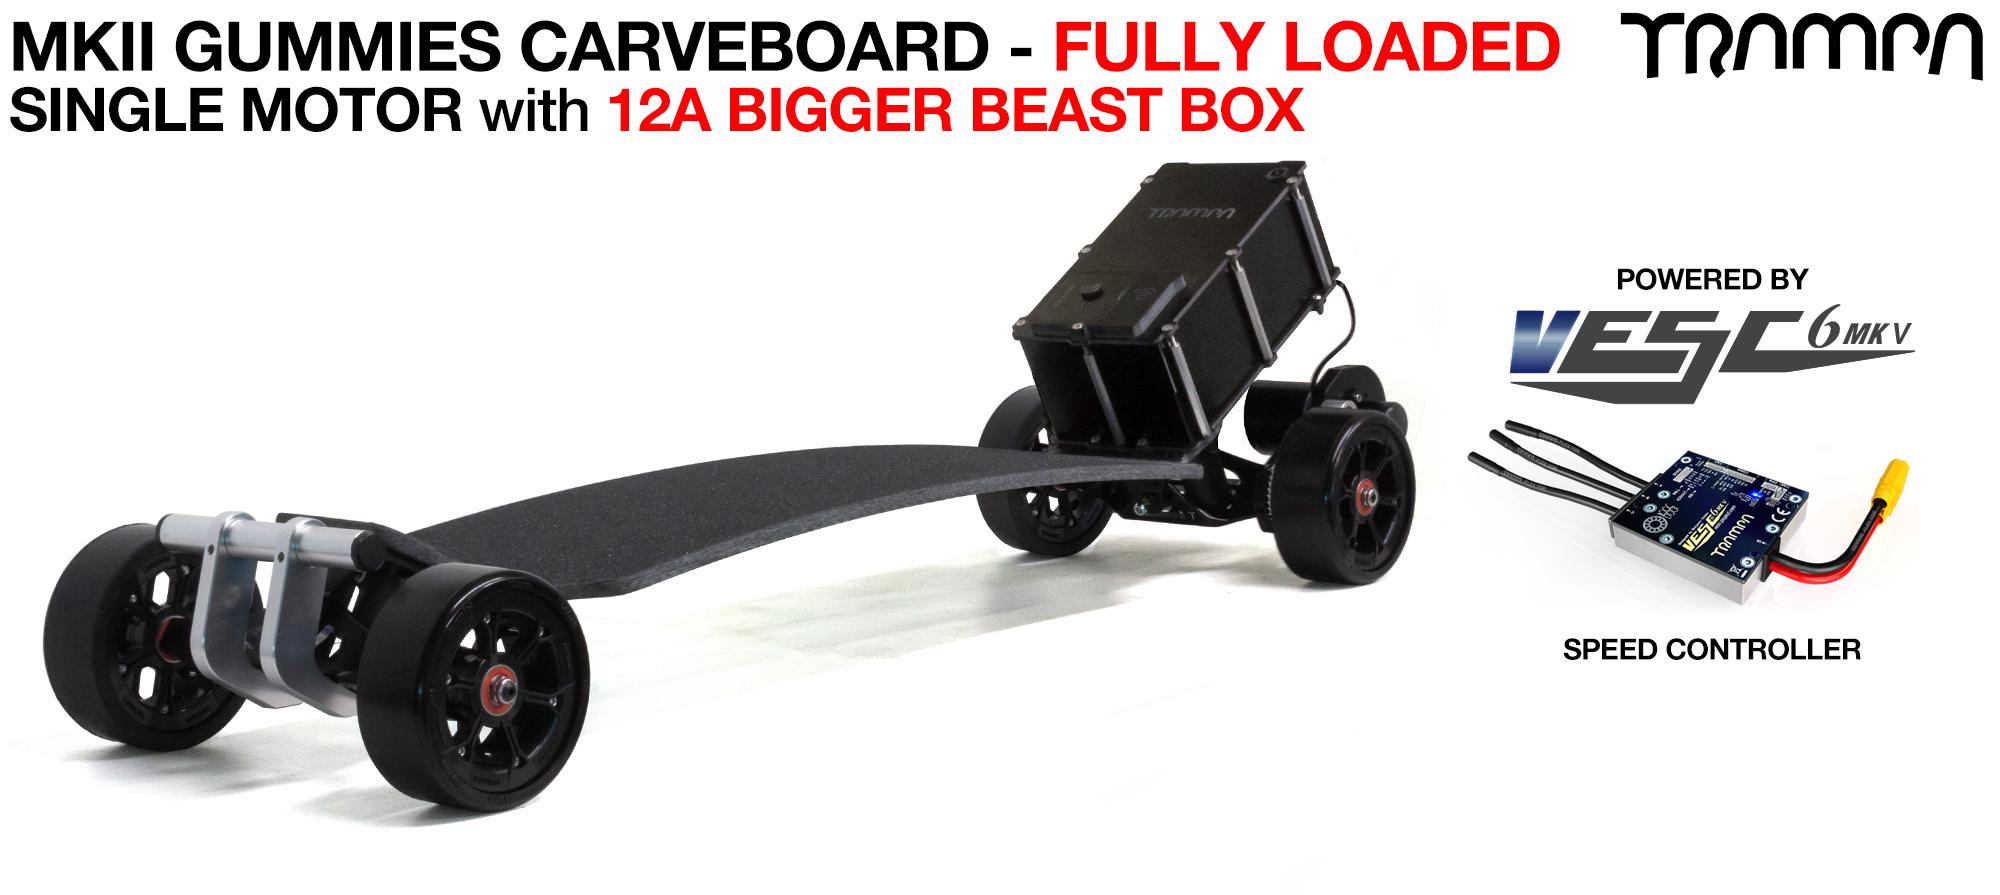 TRAMPA's MkII Electric GUMMIES Carveboard - uses Mini Spring Trucks with MkII Carve board Motor Mount,s Custom TRAMPA hubs & 125mm GUMMIES longboard Tyres - SINGLE Motor 12A FULLY LOADED